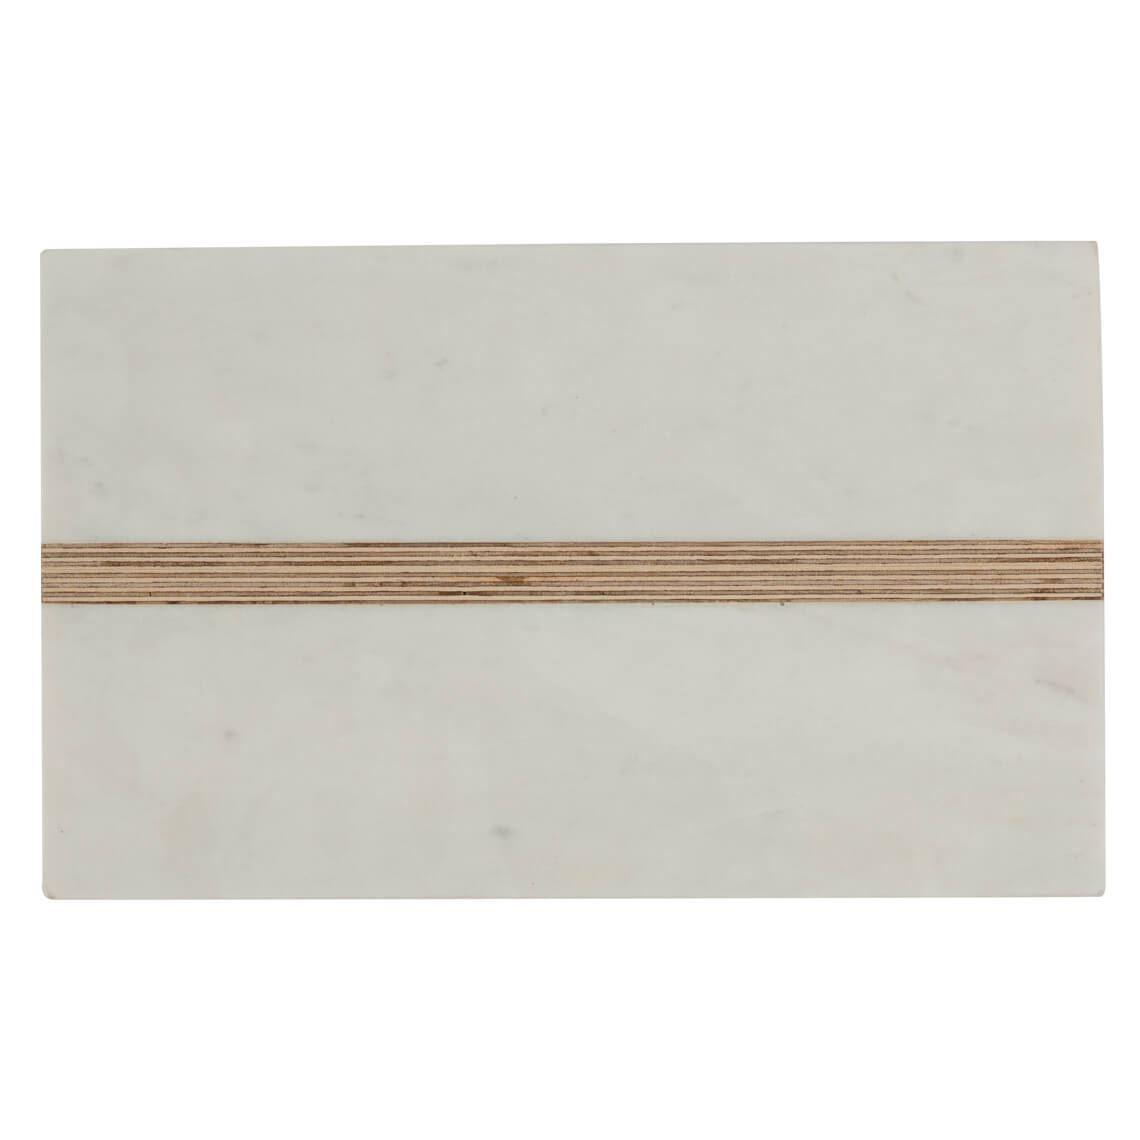 Marble Cheese Board Size W 20cm x D 33cm x H 2cm in White Freedom